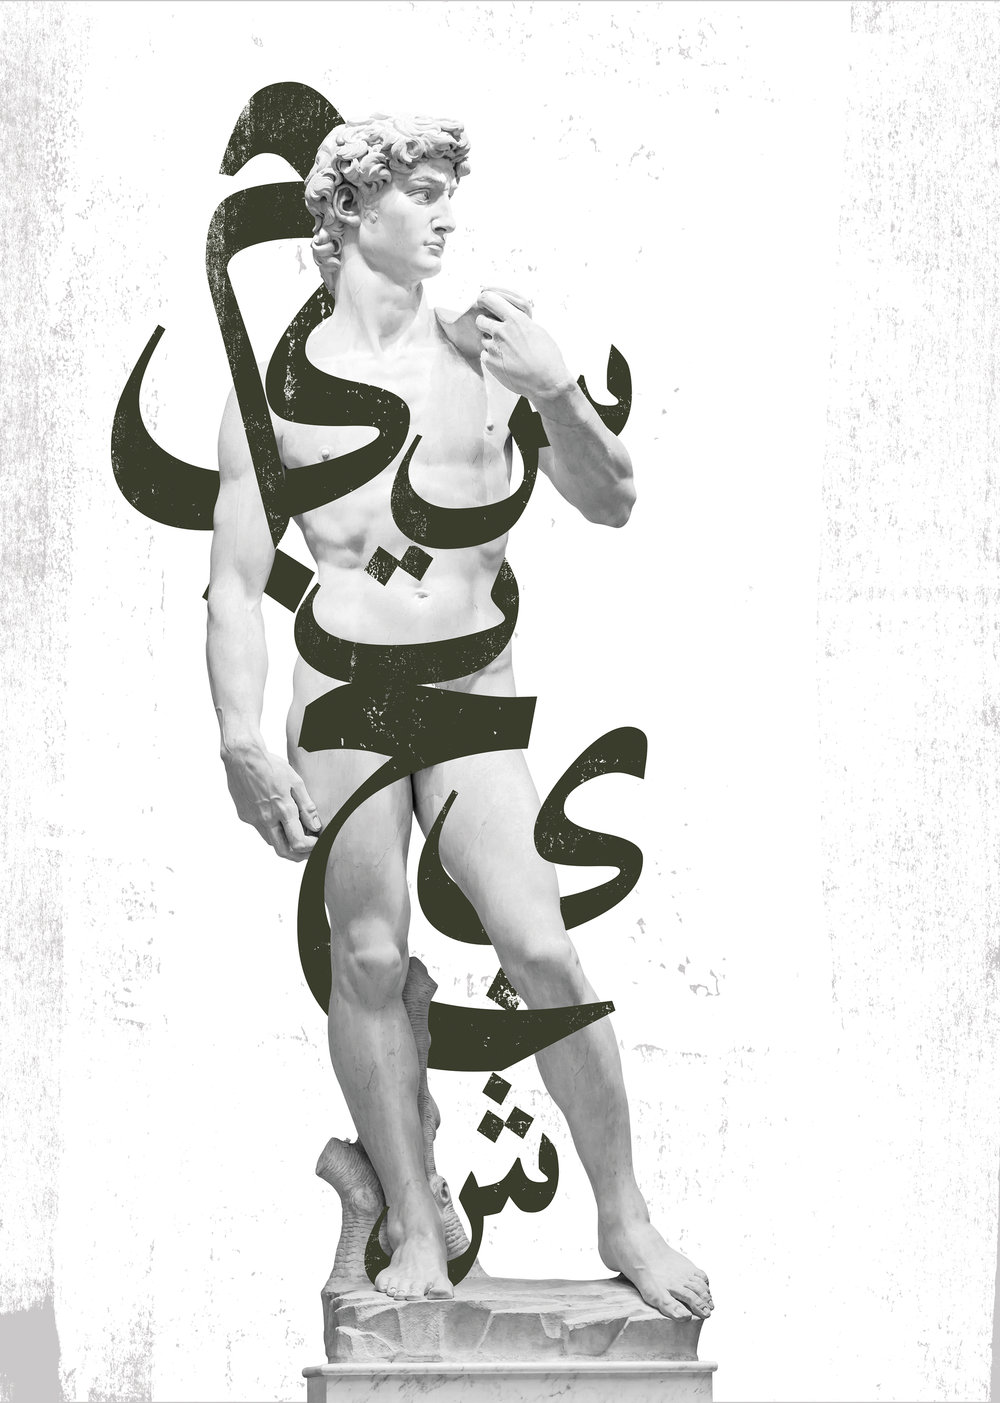 <b>Younes Zemmouri</b></br><i>Maysathishe (Shame</i> series)</br>digital art print on archival paper</br>limited edition of 30</br>20 x 16 inches</br>$400 unframed / $600 framed